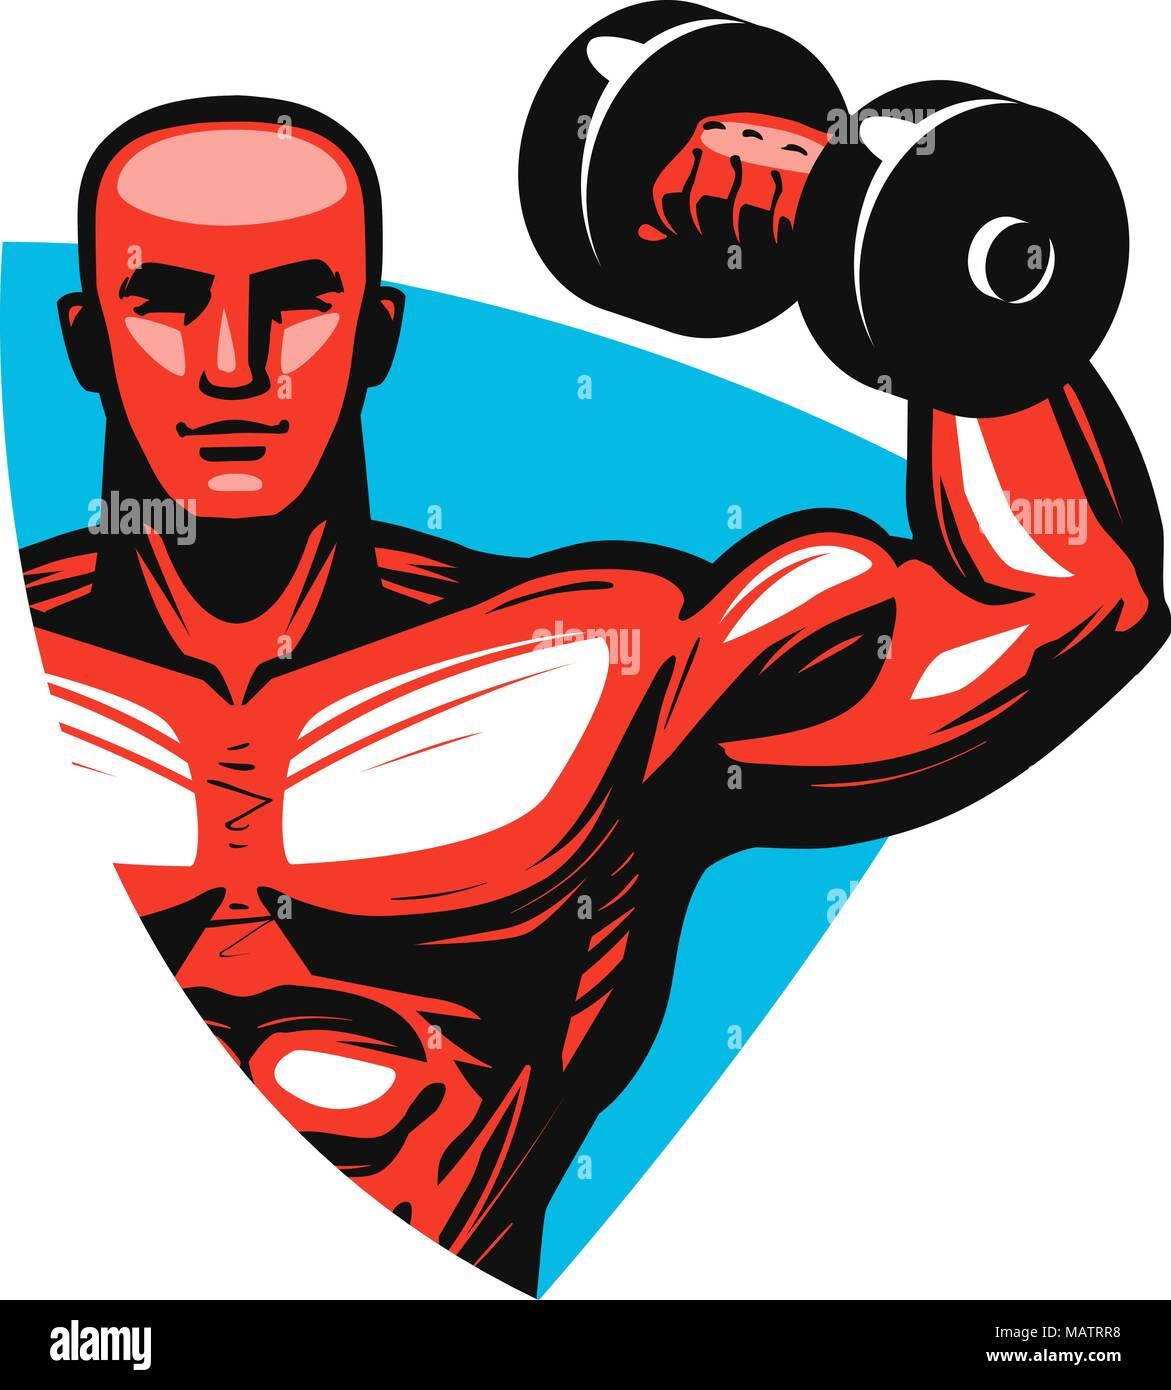 Gym logo or label. Sport concept. Vector illustration - Stock Vector